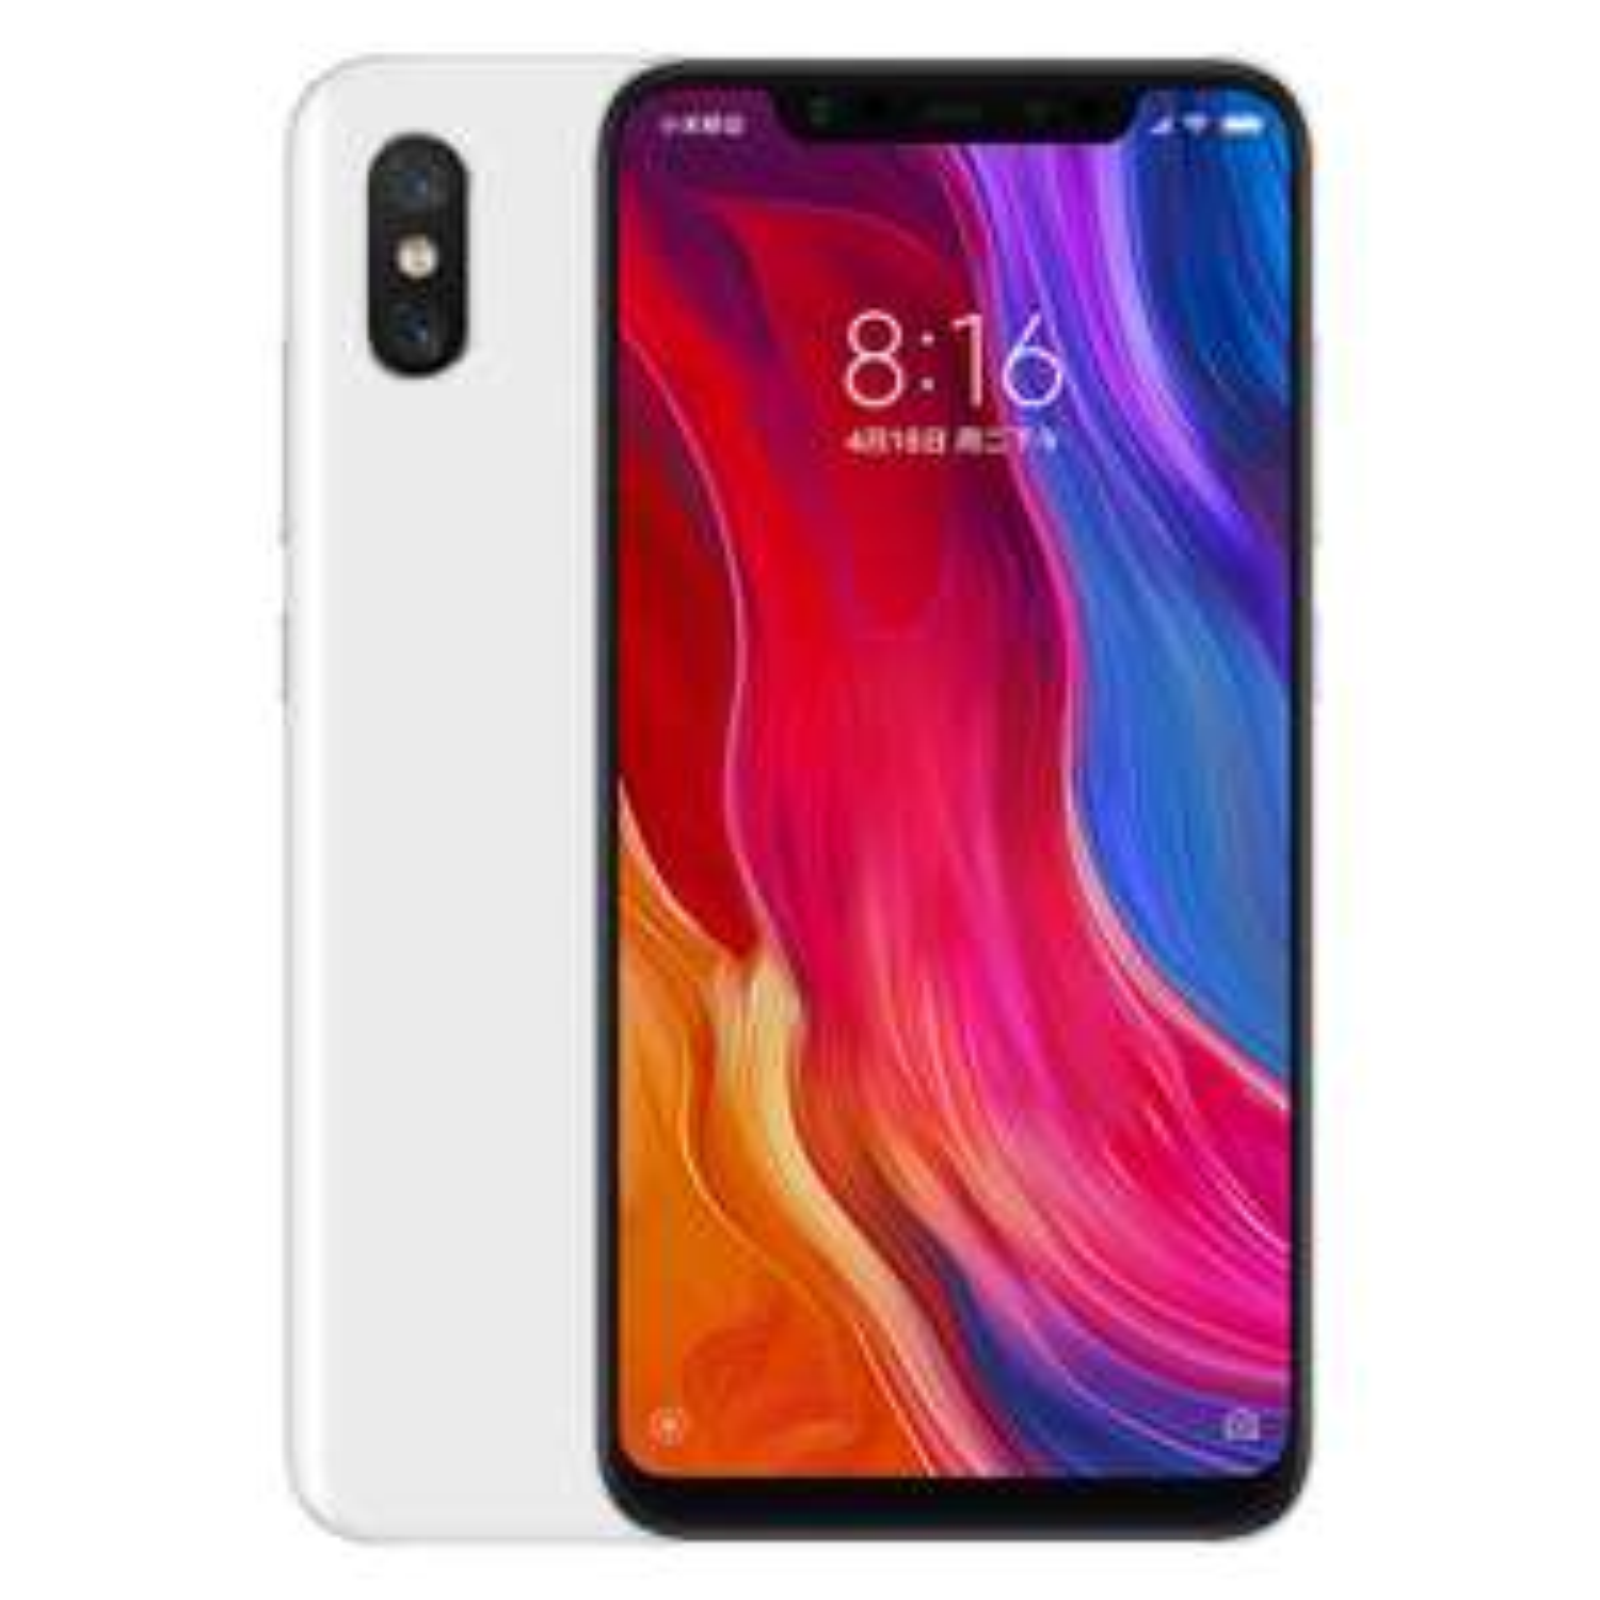 Xiaomi Mi 8 6GB/128GB - £328.99 @ Toby Deals